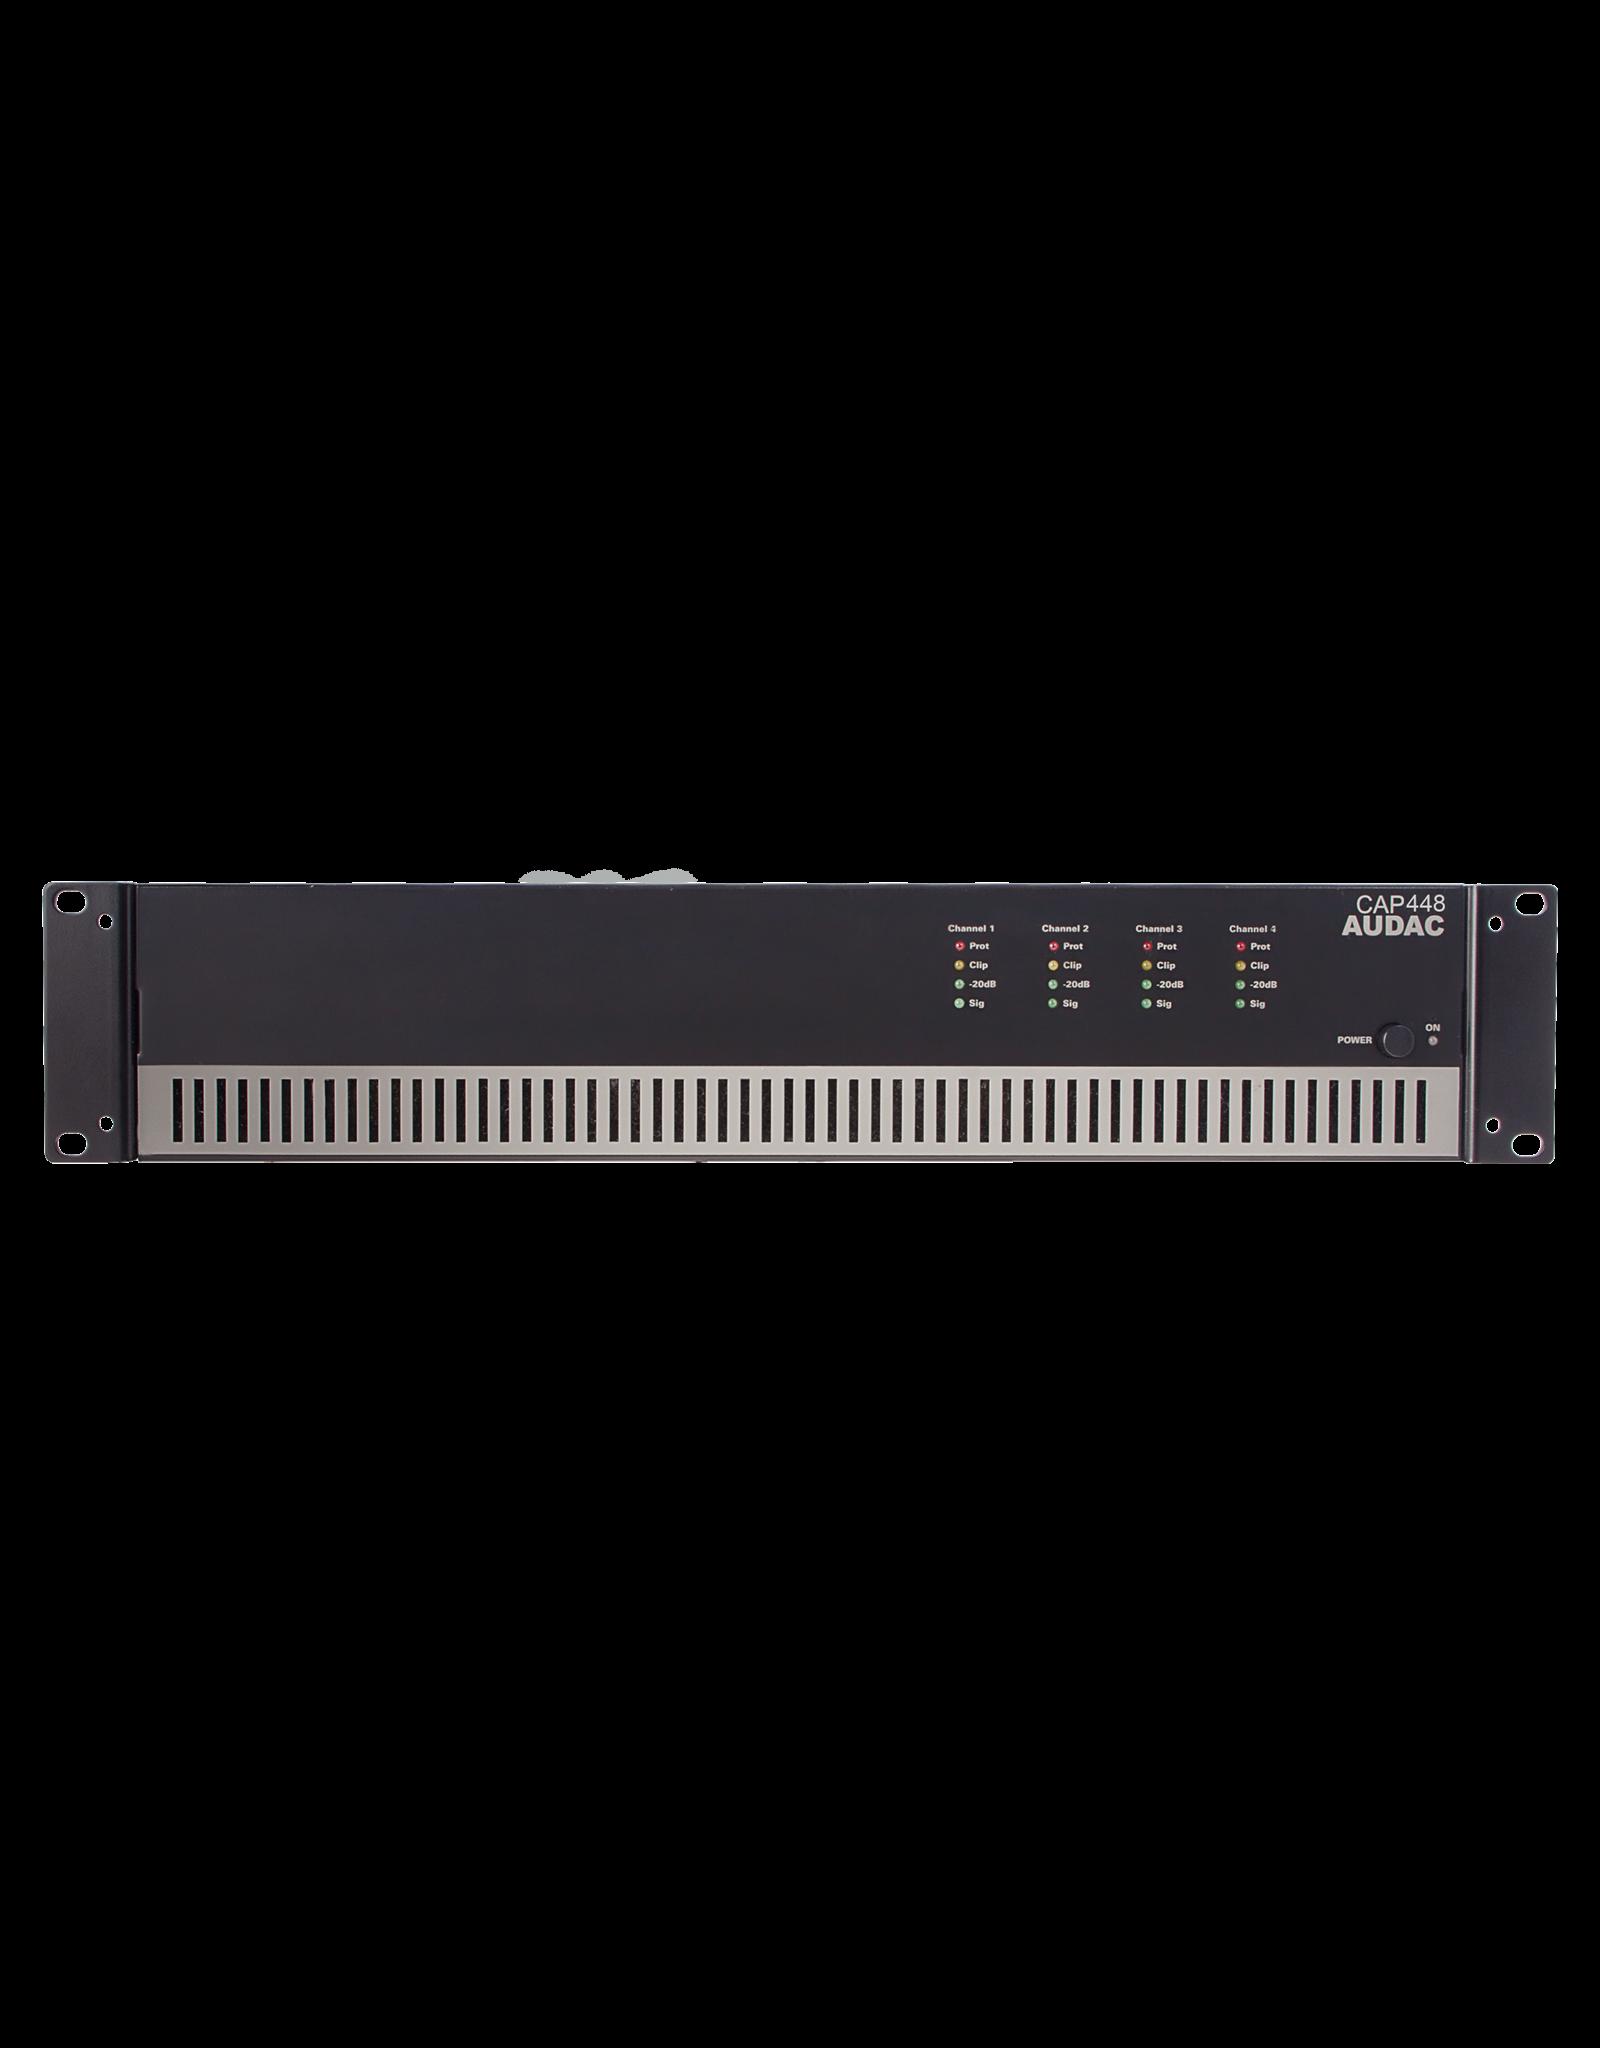 Audac Quad-channel power amplifier 4 x 480W 100V